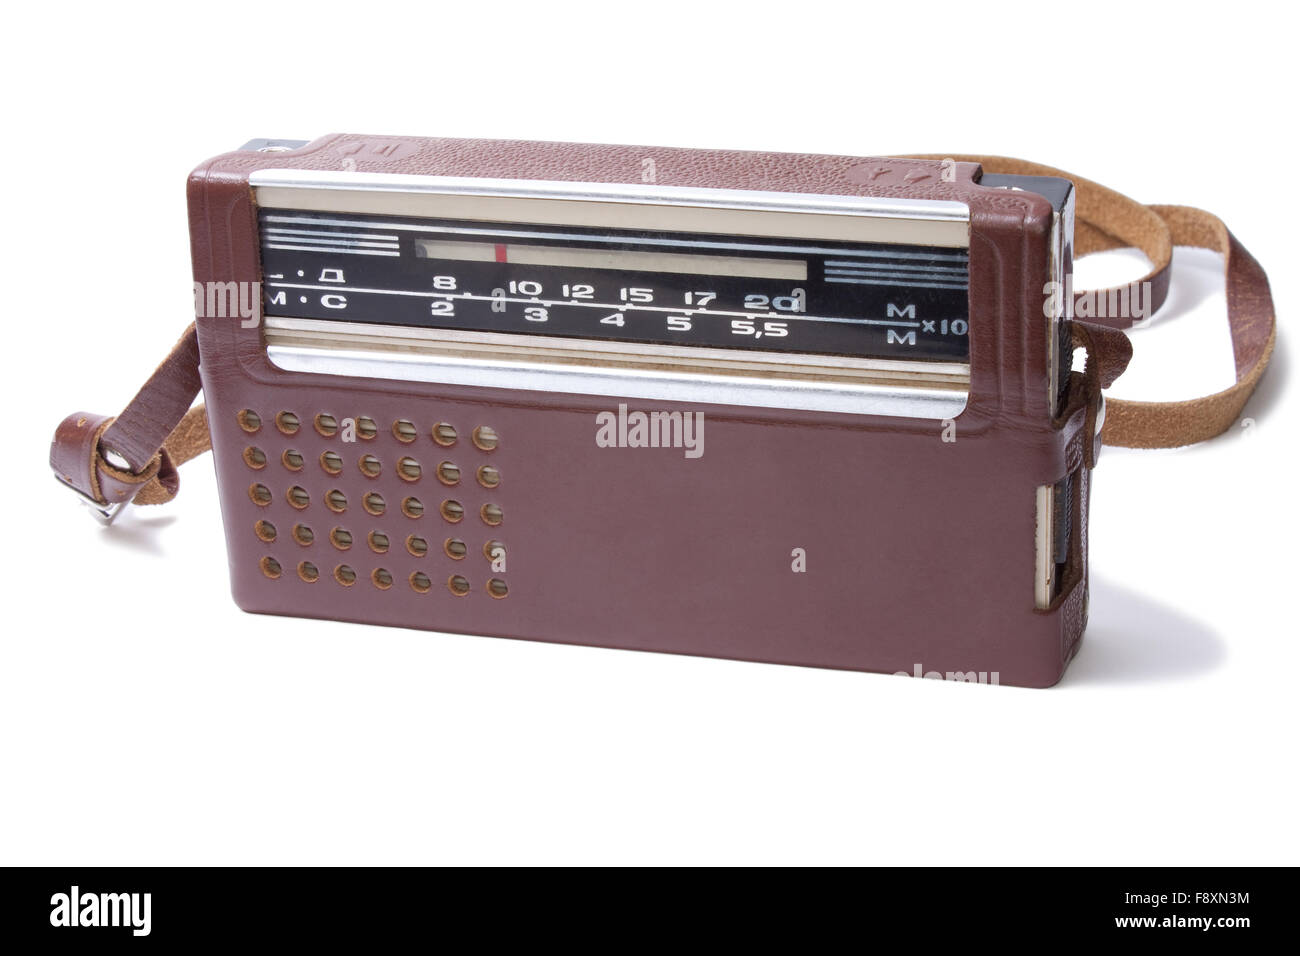 Old Transistor Radio isolated - Stock Image